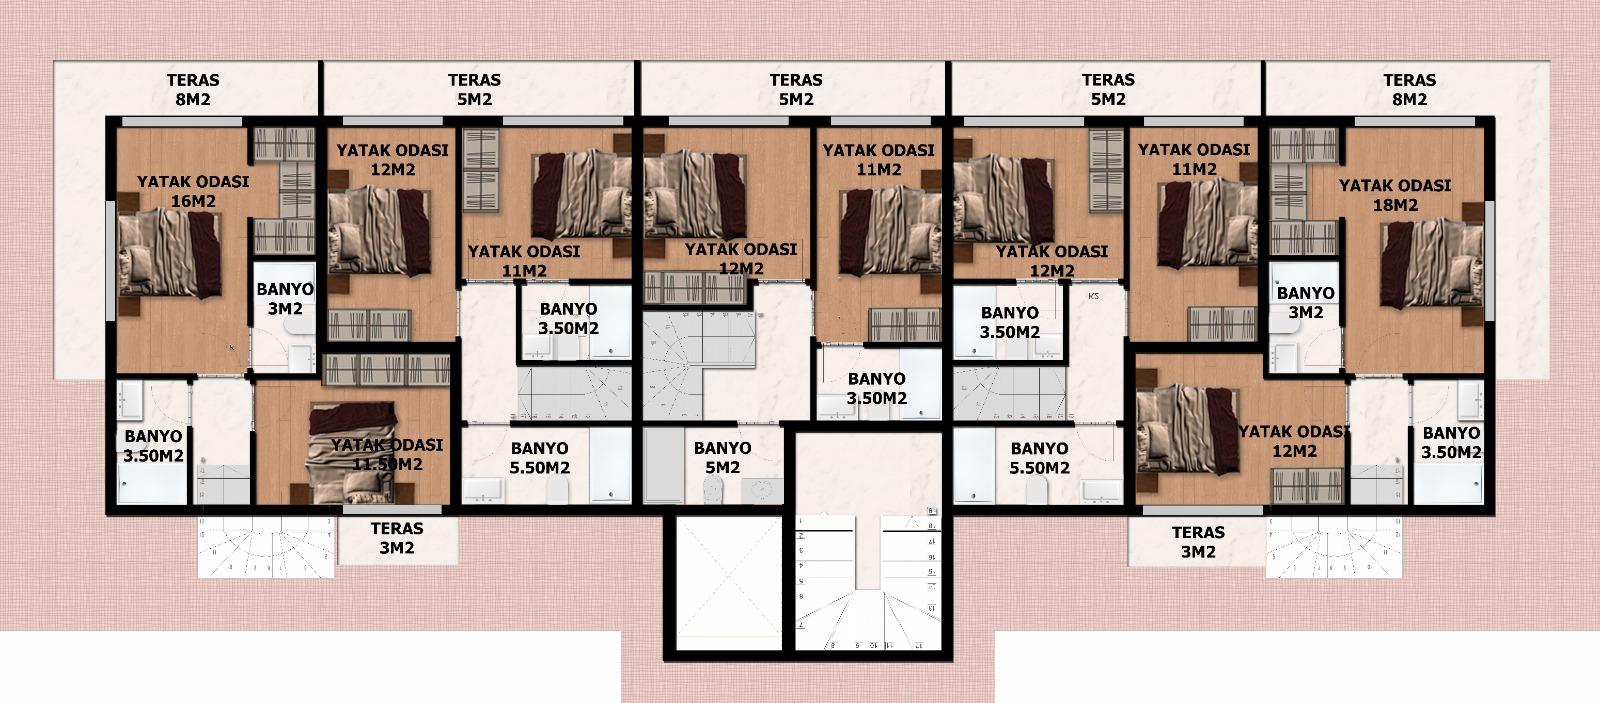 Продажа квартир по ценам застройщика в новом инвестиционном проекте - Фото 13